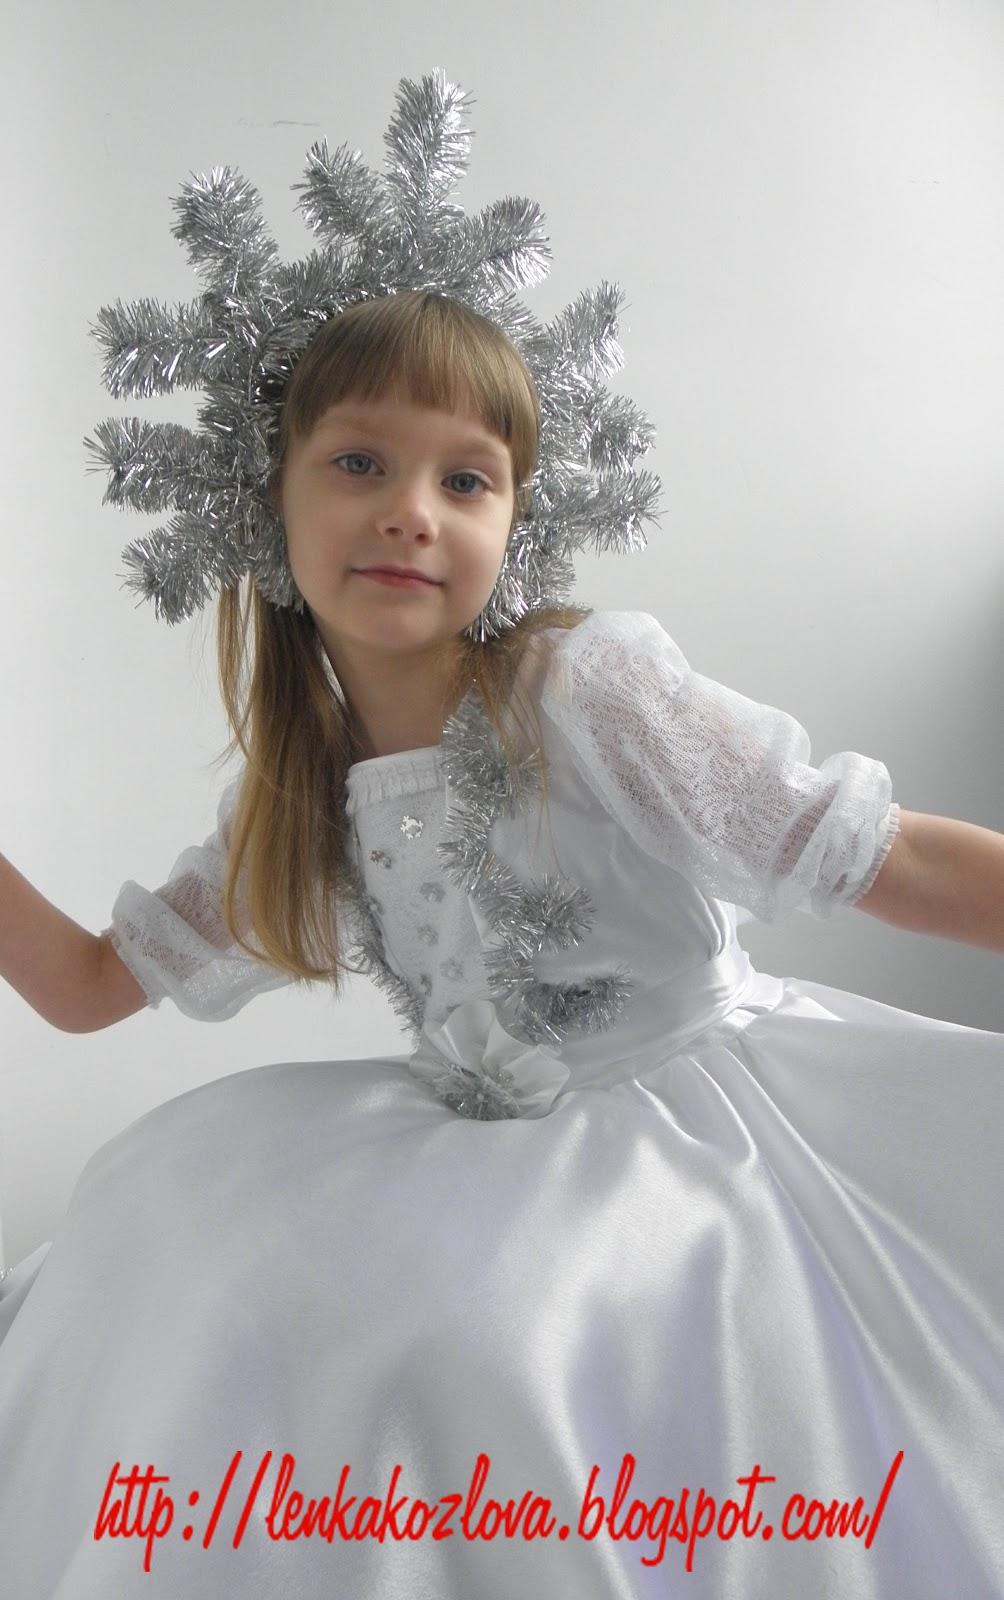 Костюм снежинки своими руками: выкройки, фото и идеи 67